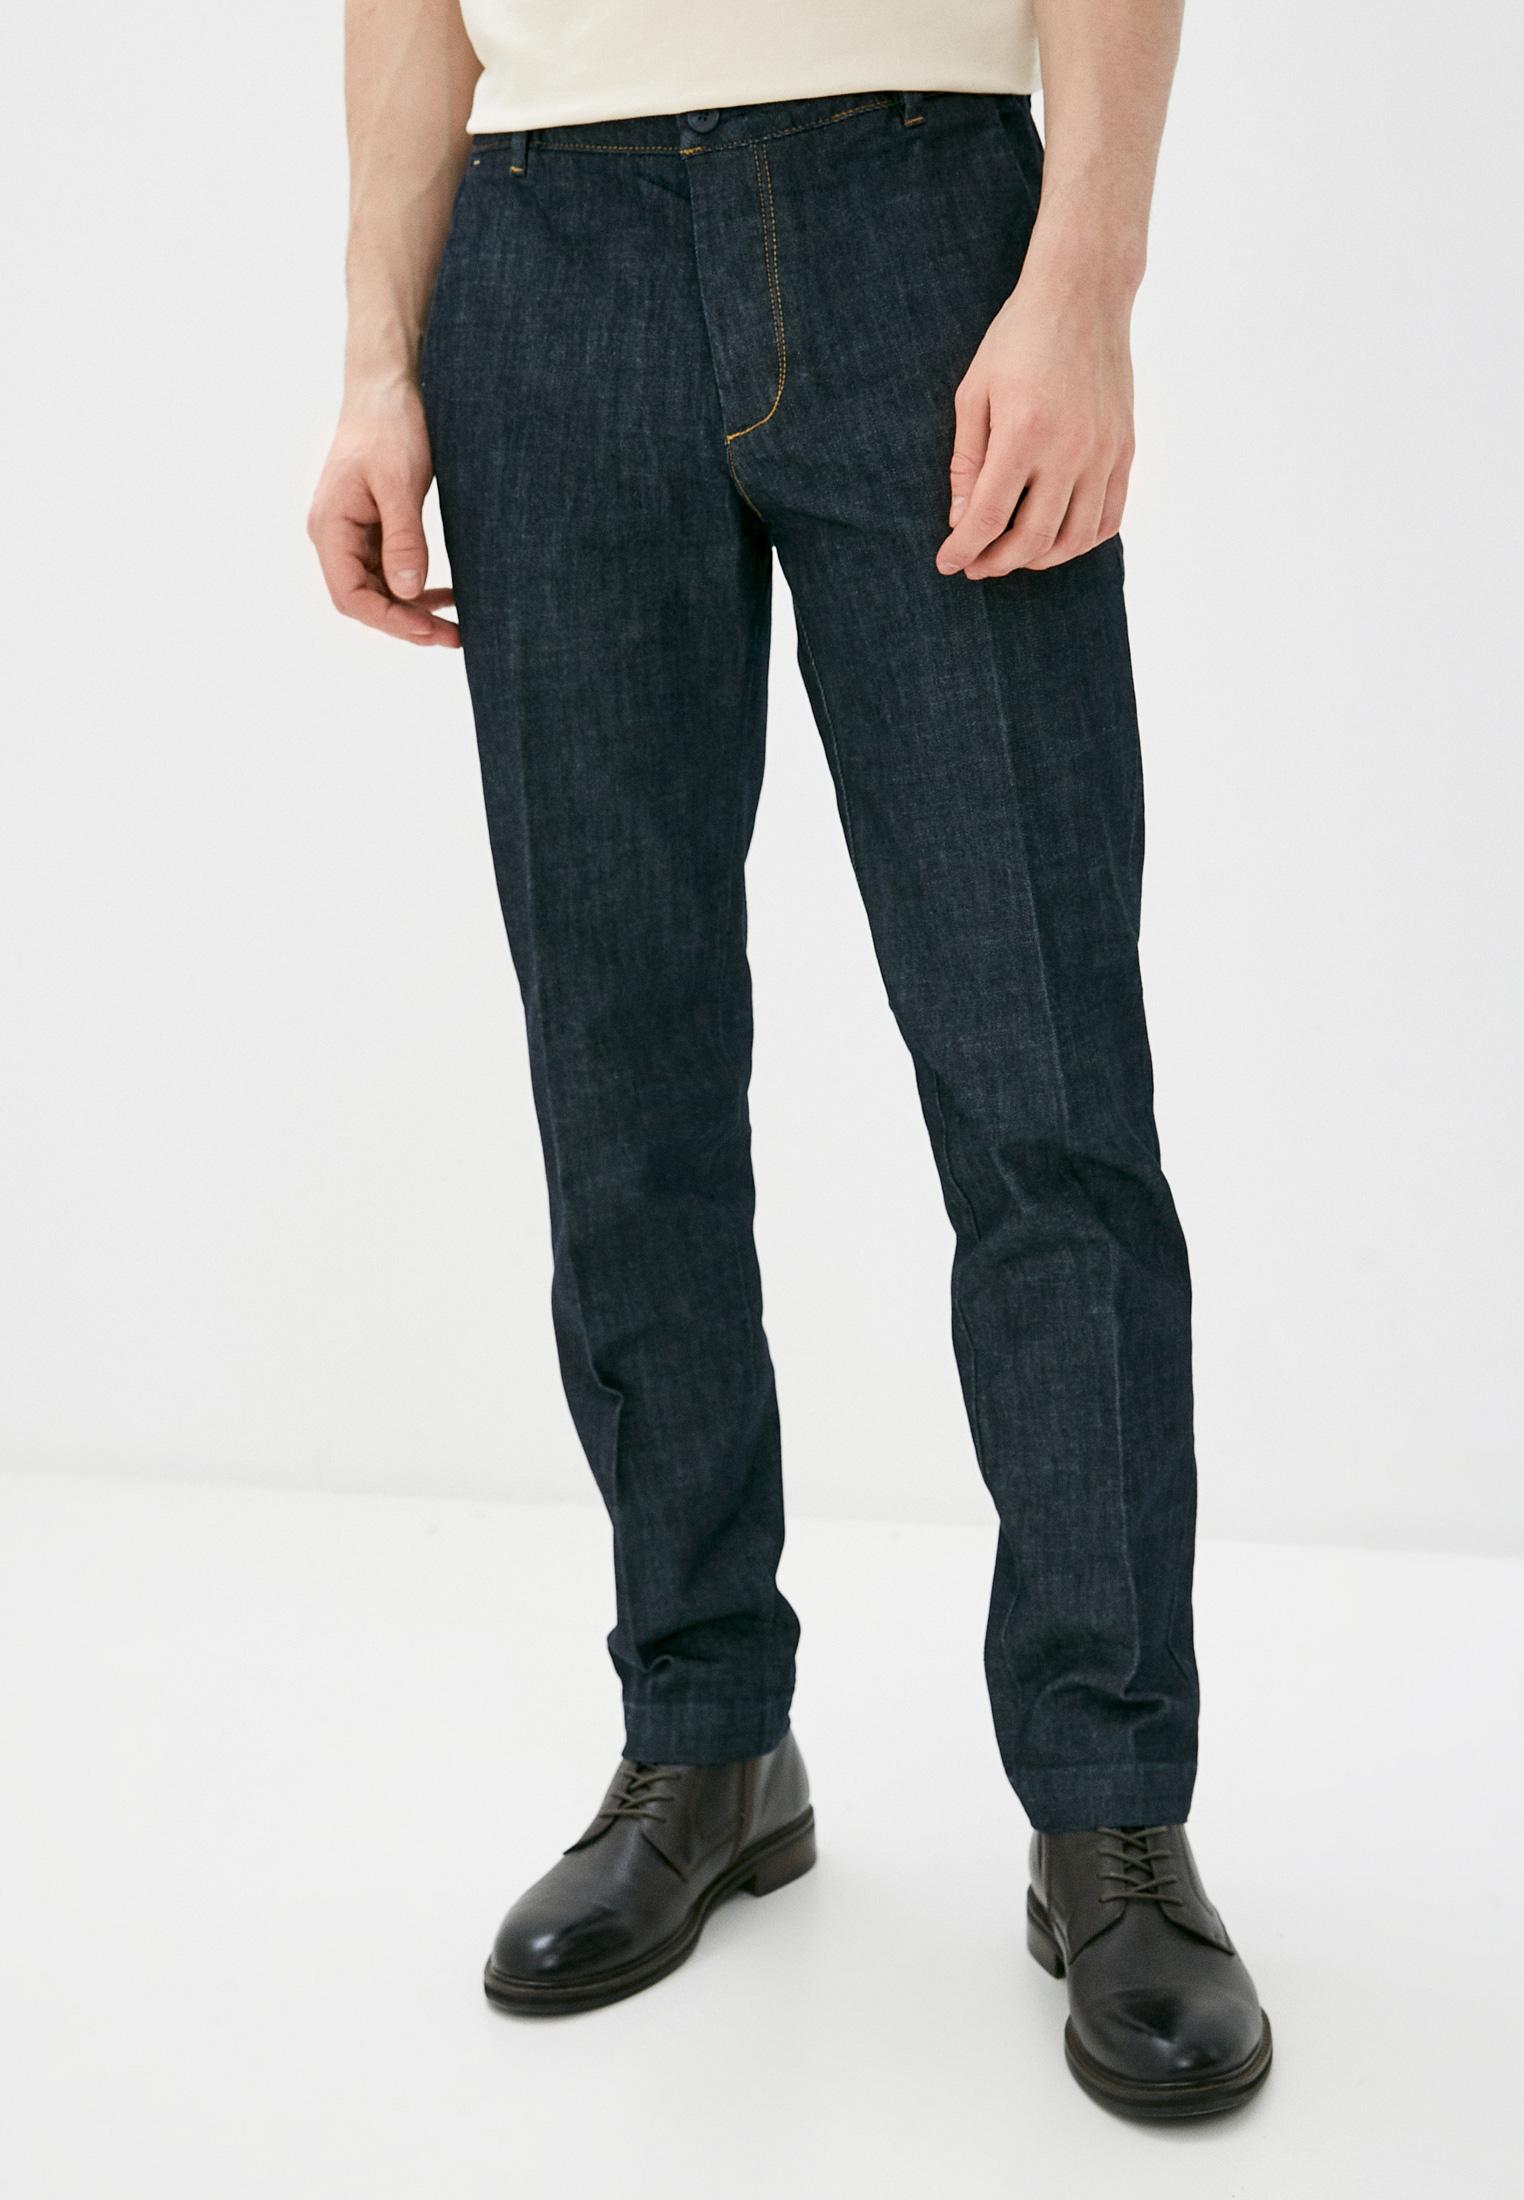 Мужские джинсовые шорты United Colors of Benetton (Юнайтед Колорс оф Бенеттон) 4GZ755I38